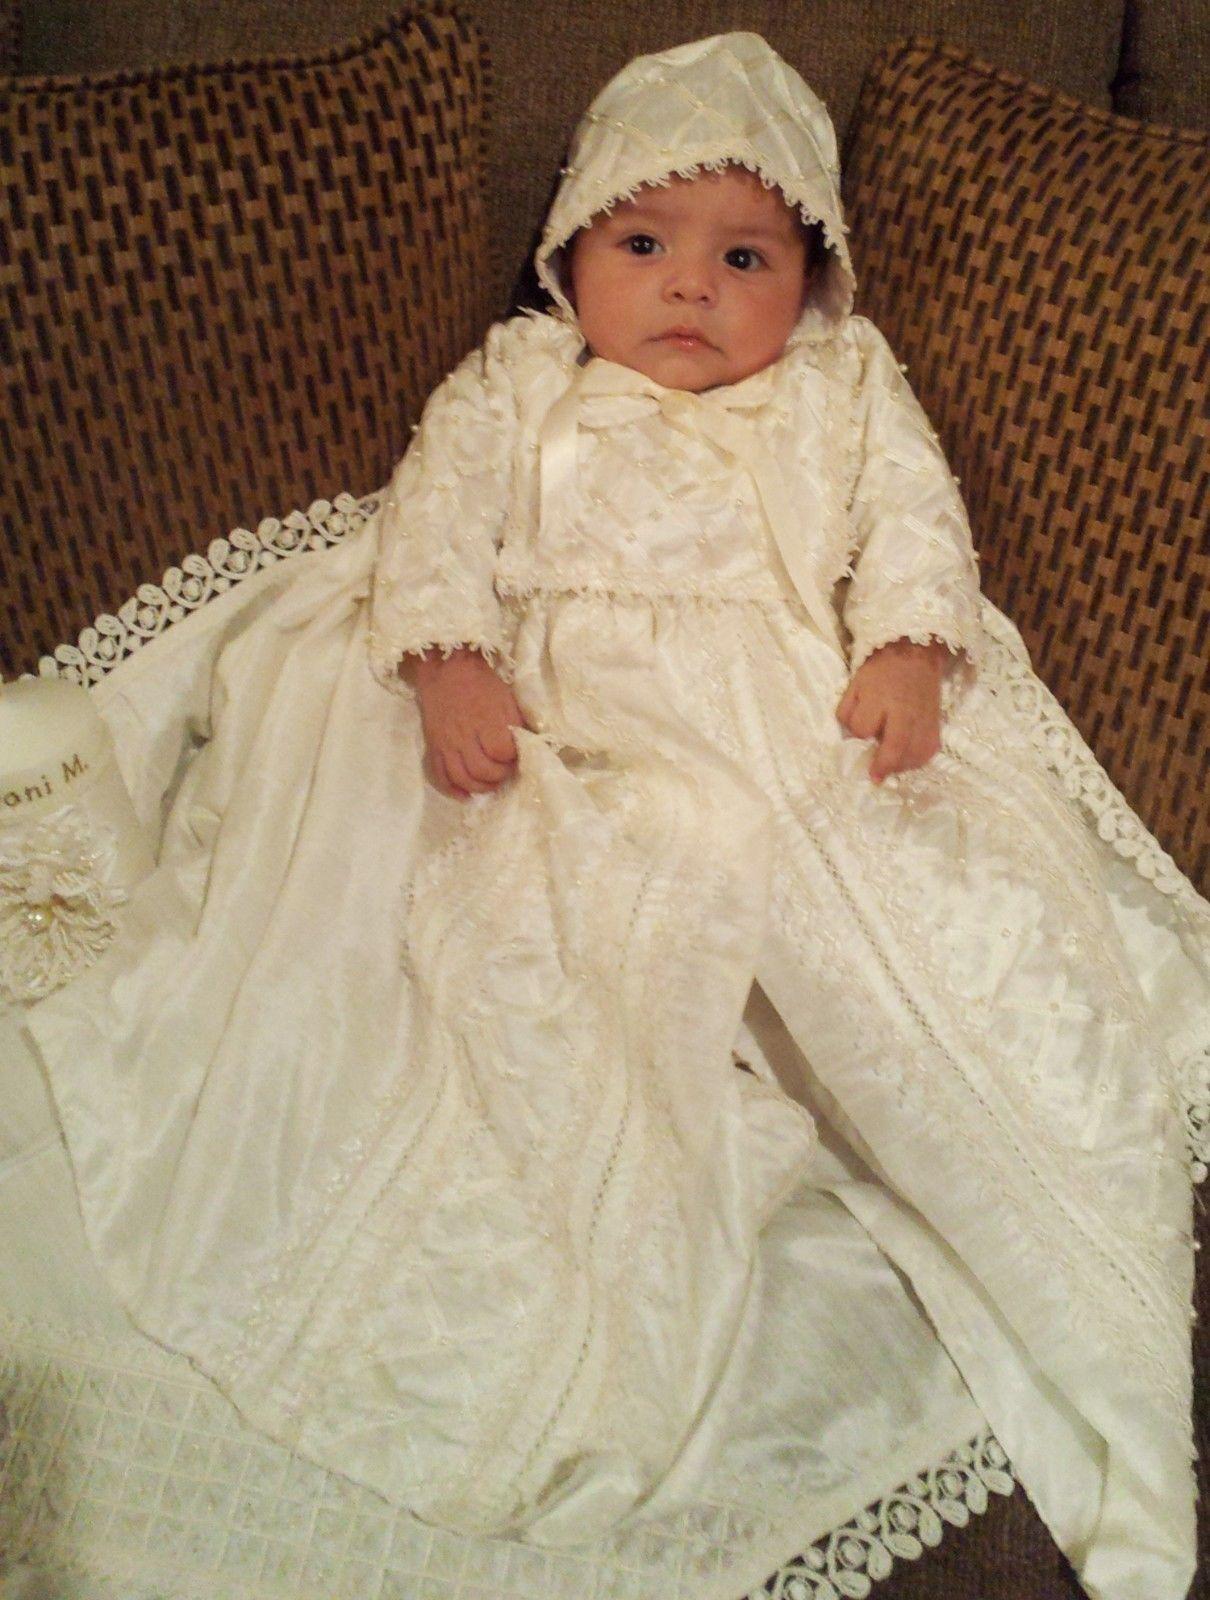 5f70815d1 Baby Boys Christening Baptism Outfit Spanish Style Ropones Para Bautizo |  eBay